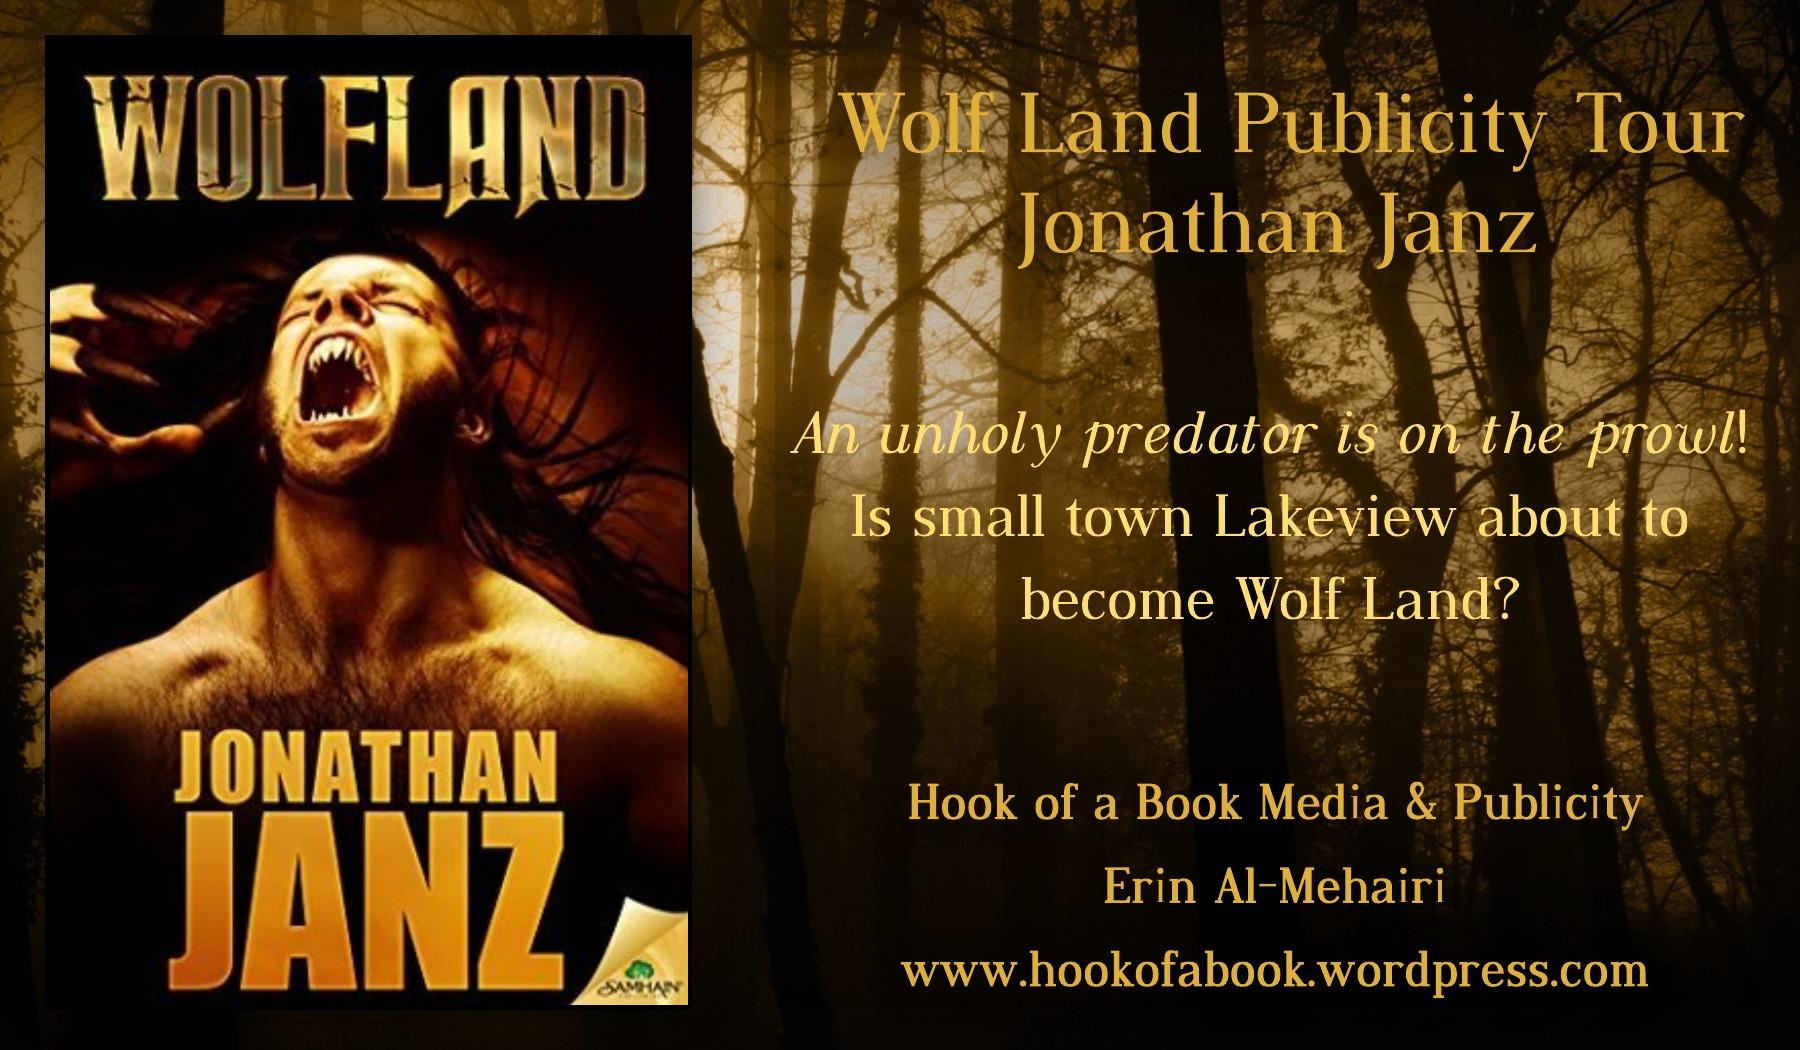 Wolf Land tour graphic.jpeg